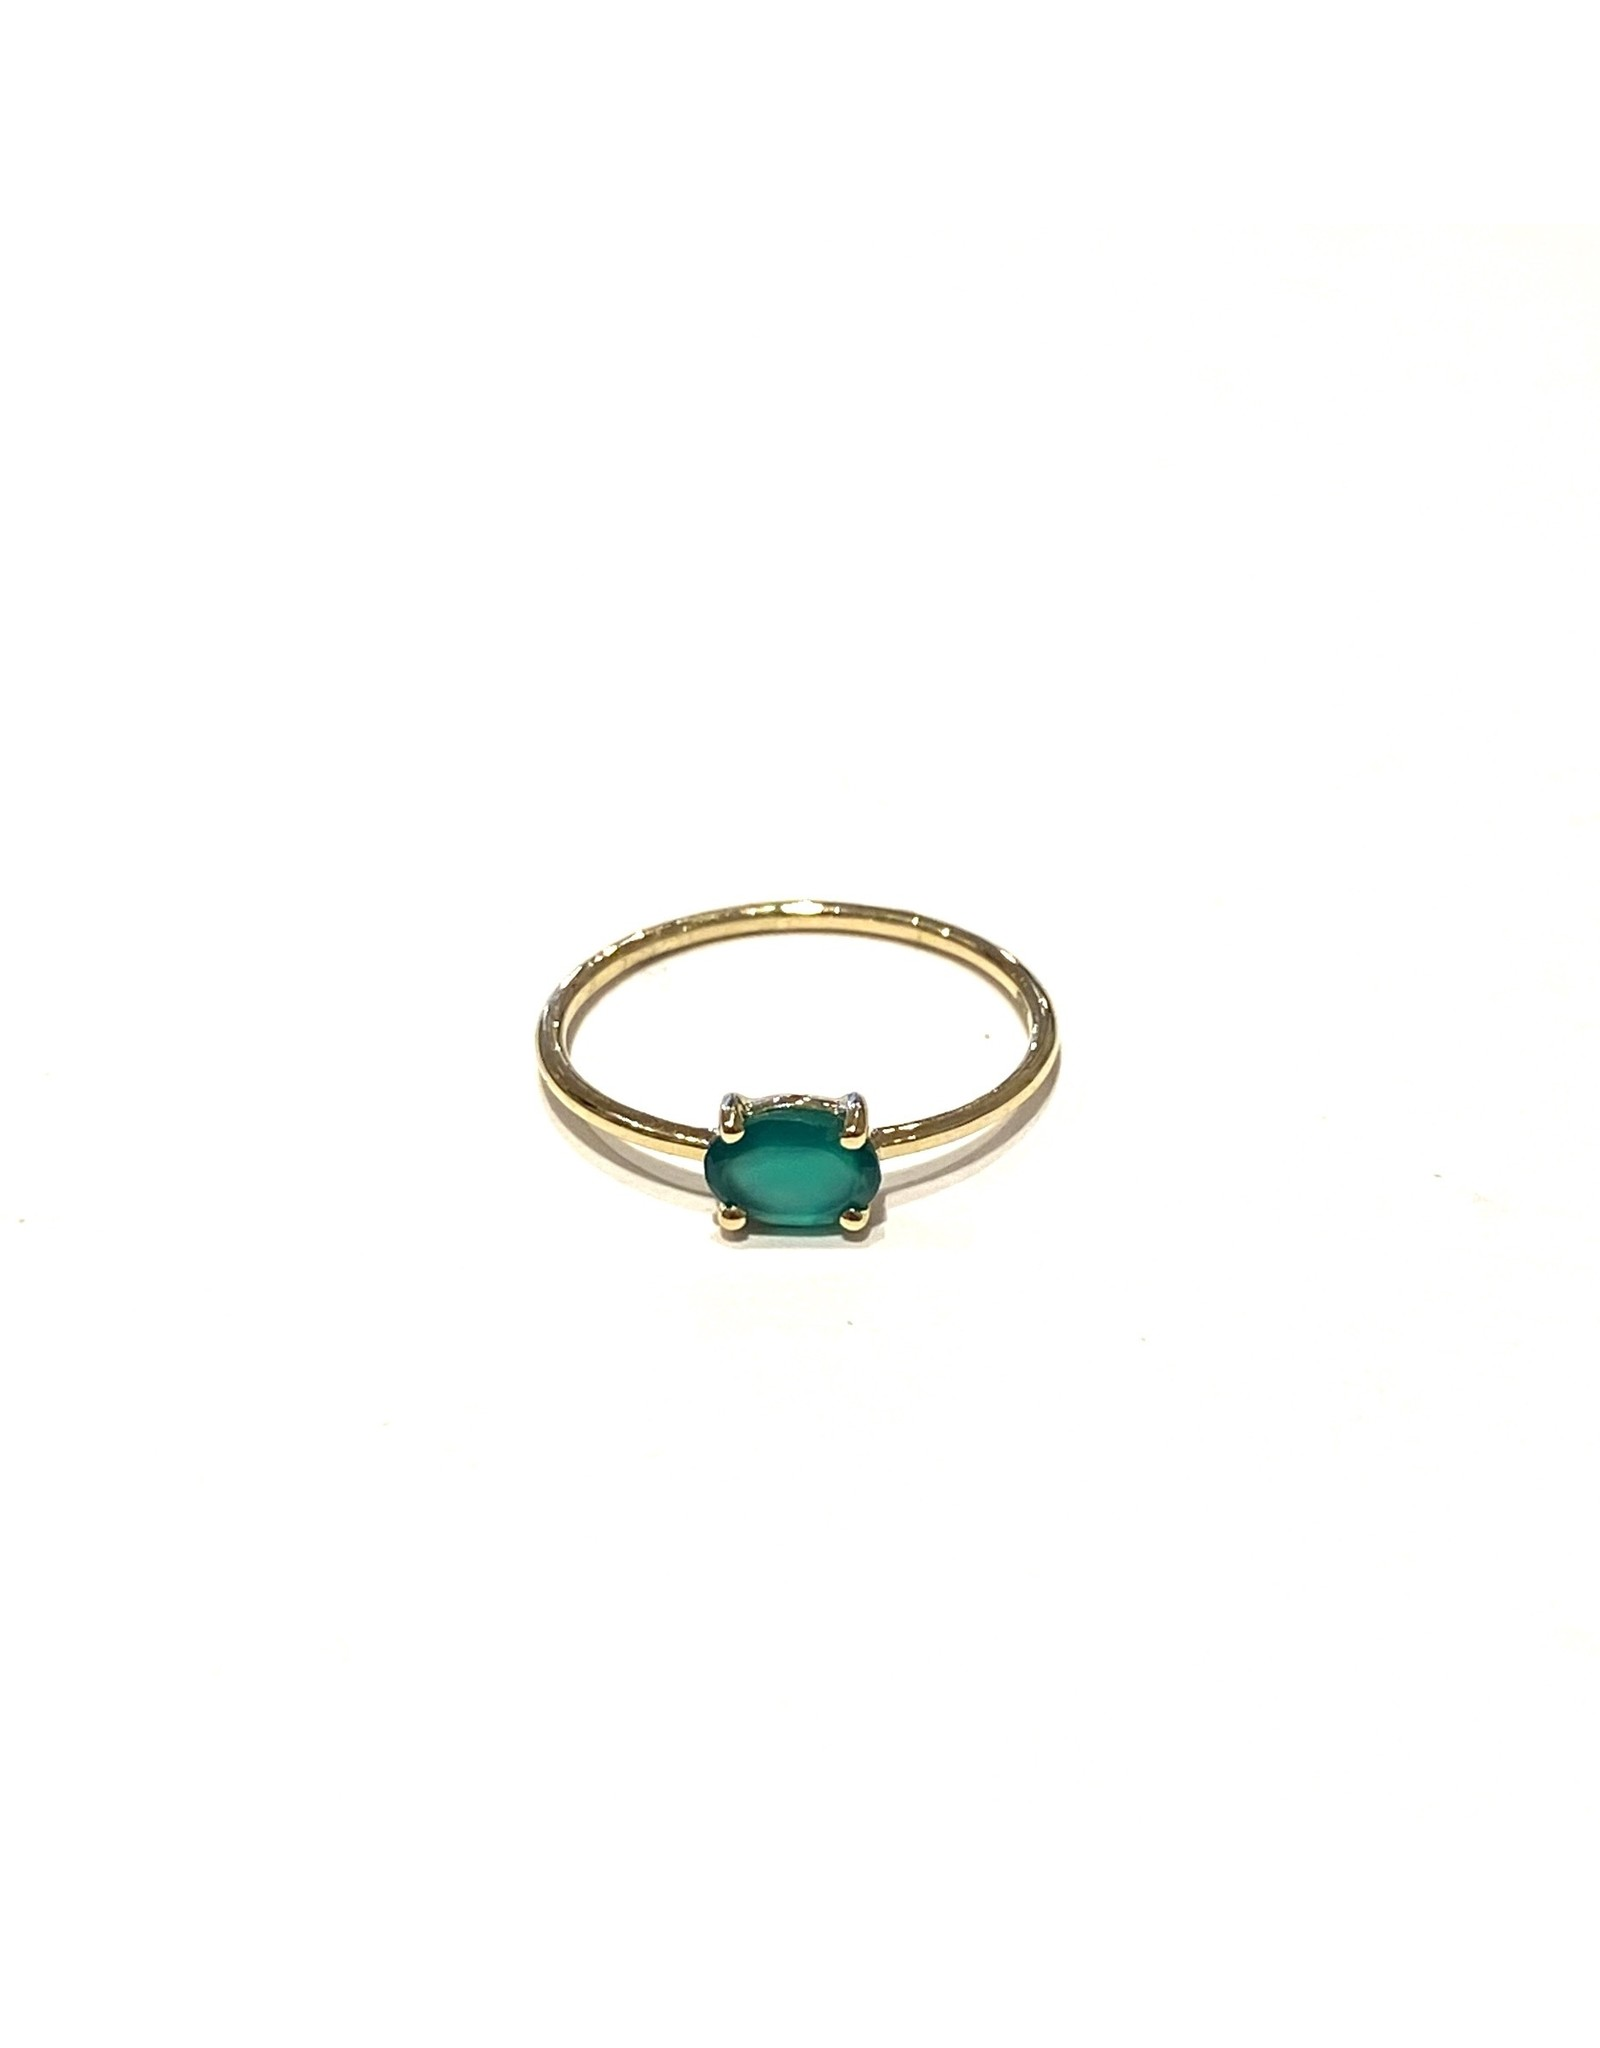 Bo Gold Ring - Goud - Groene Onyx